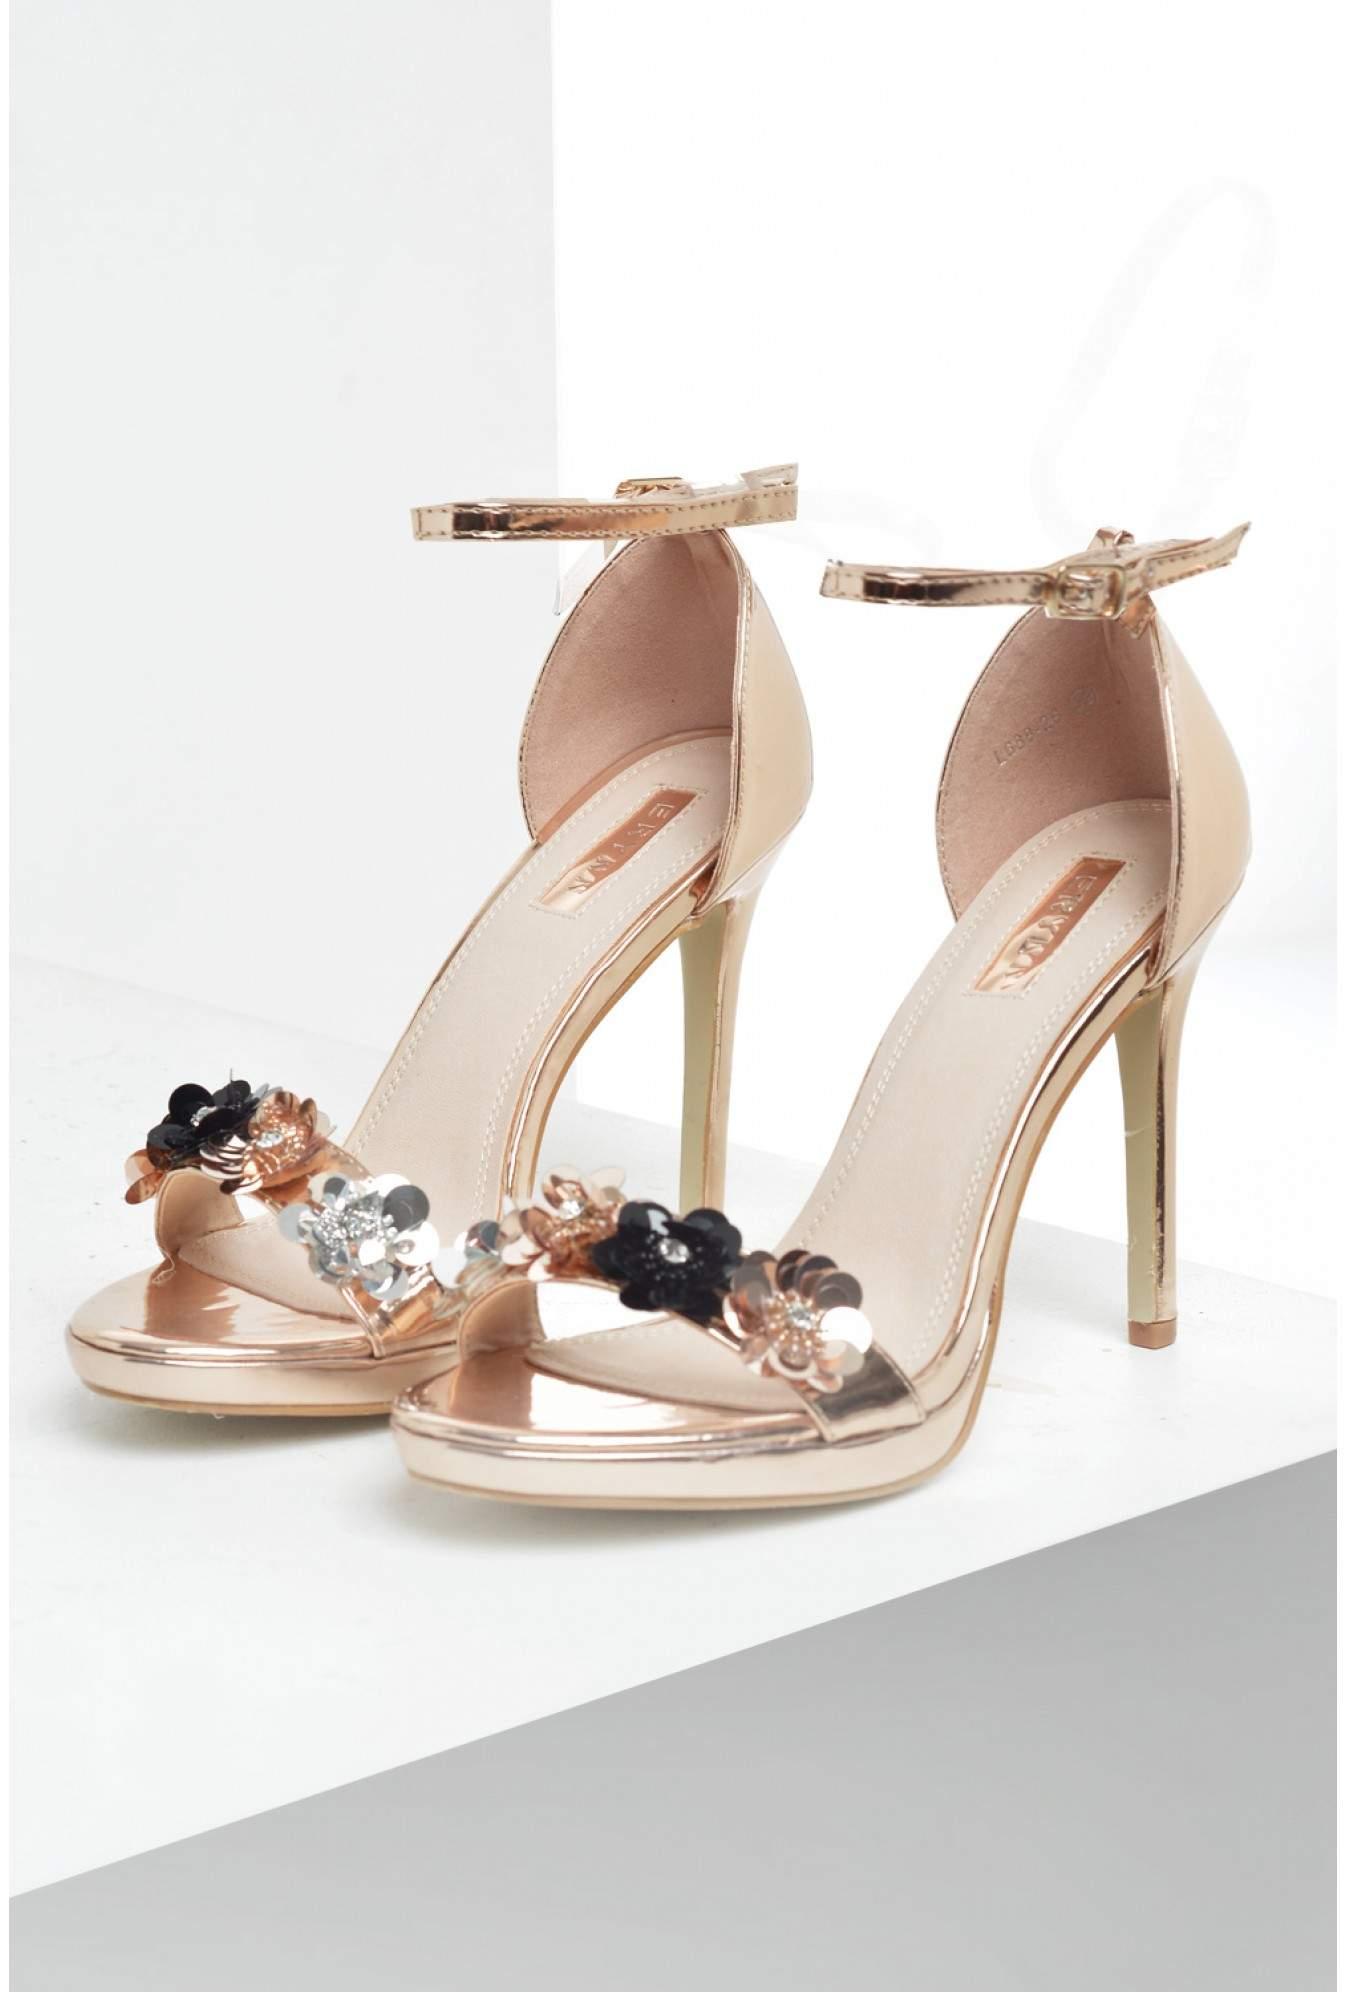 e511328586a11 Sole City Orli Flower Embellished Sandals in Rose Gold